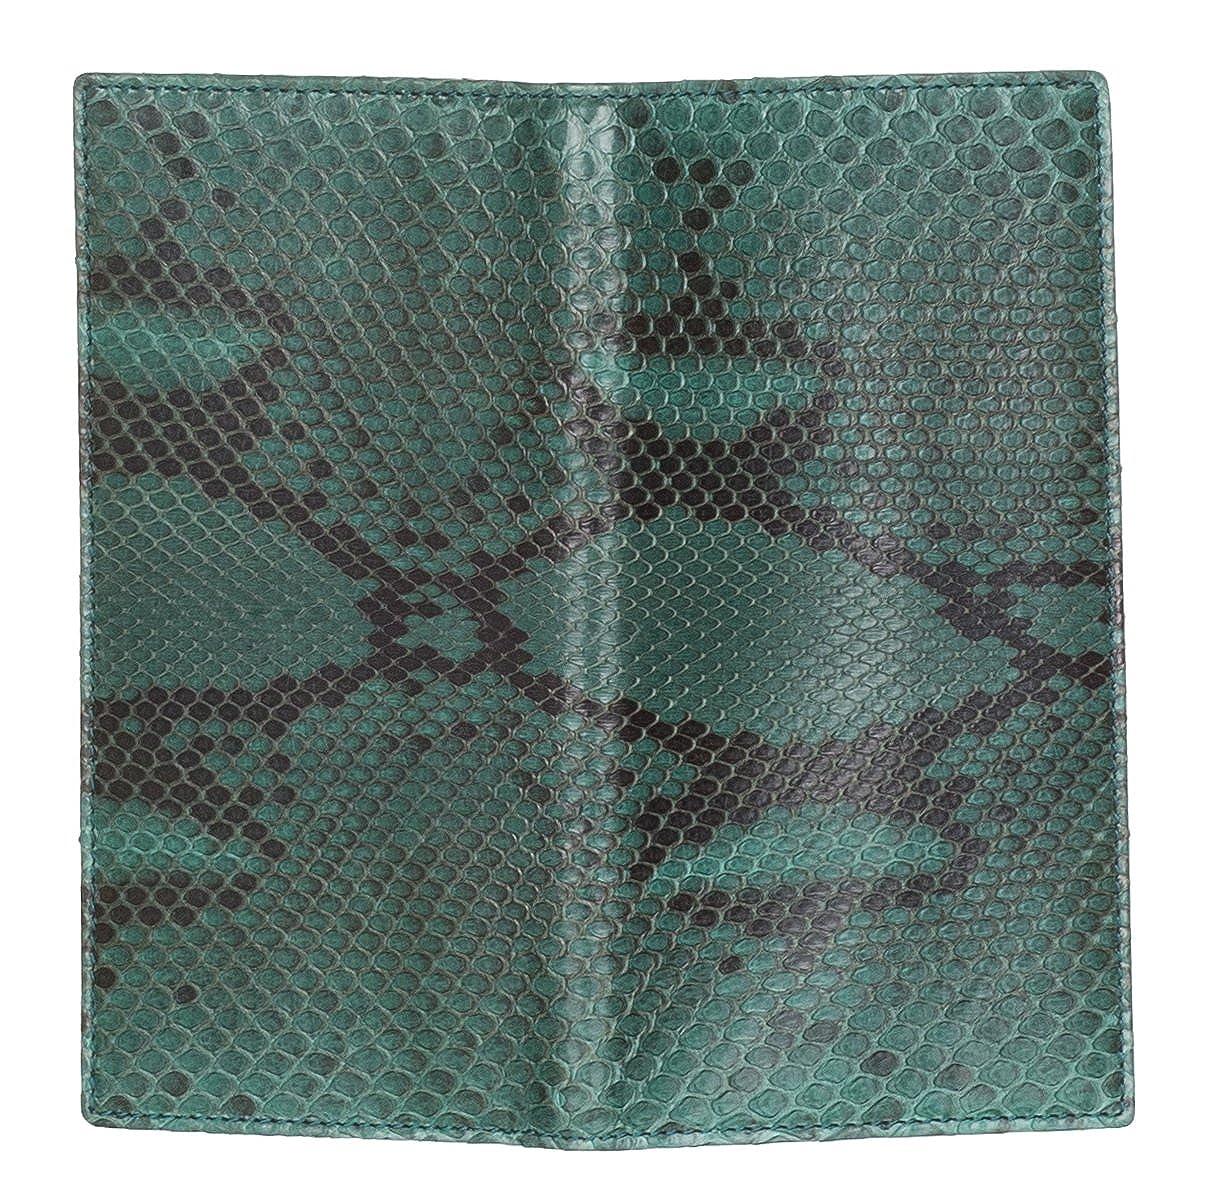 d7ba1db7476a Amazon.com: Gucci Green Python Snakeskin Long Bi Fold Wallet: Shoes